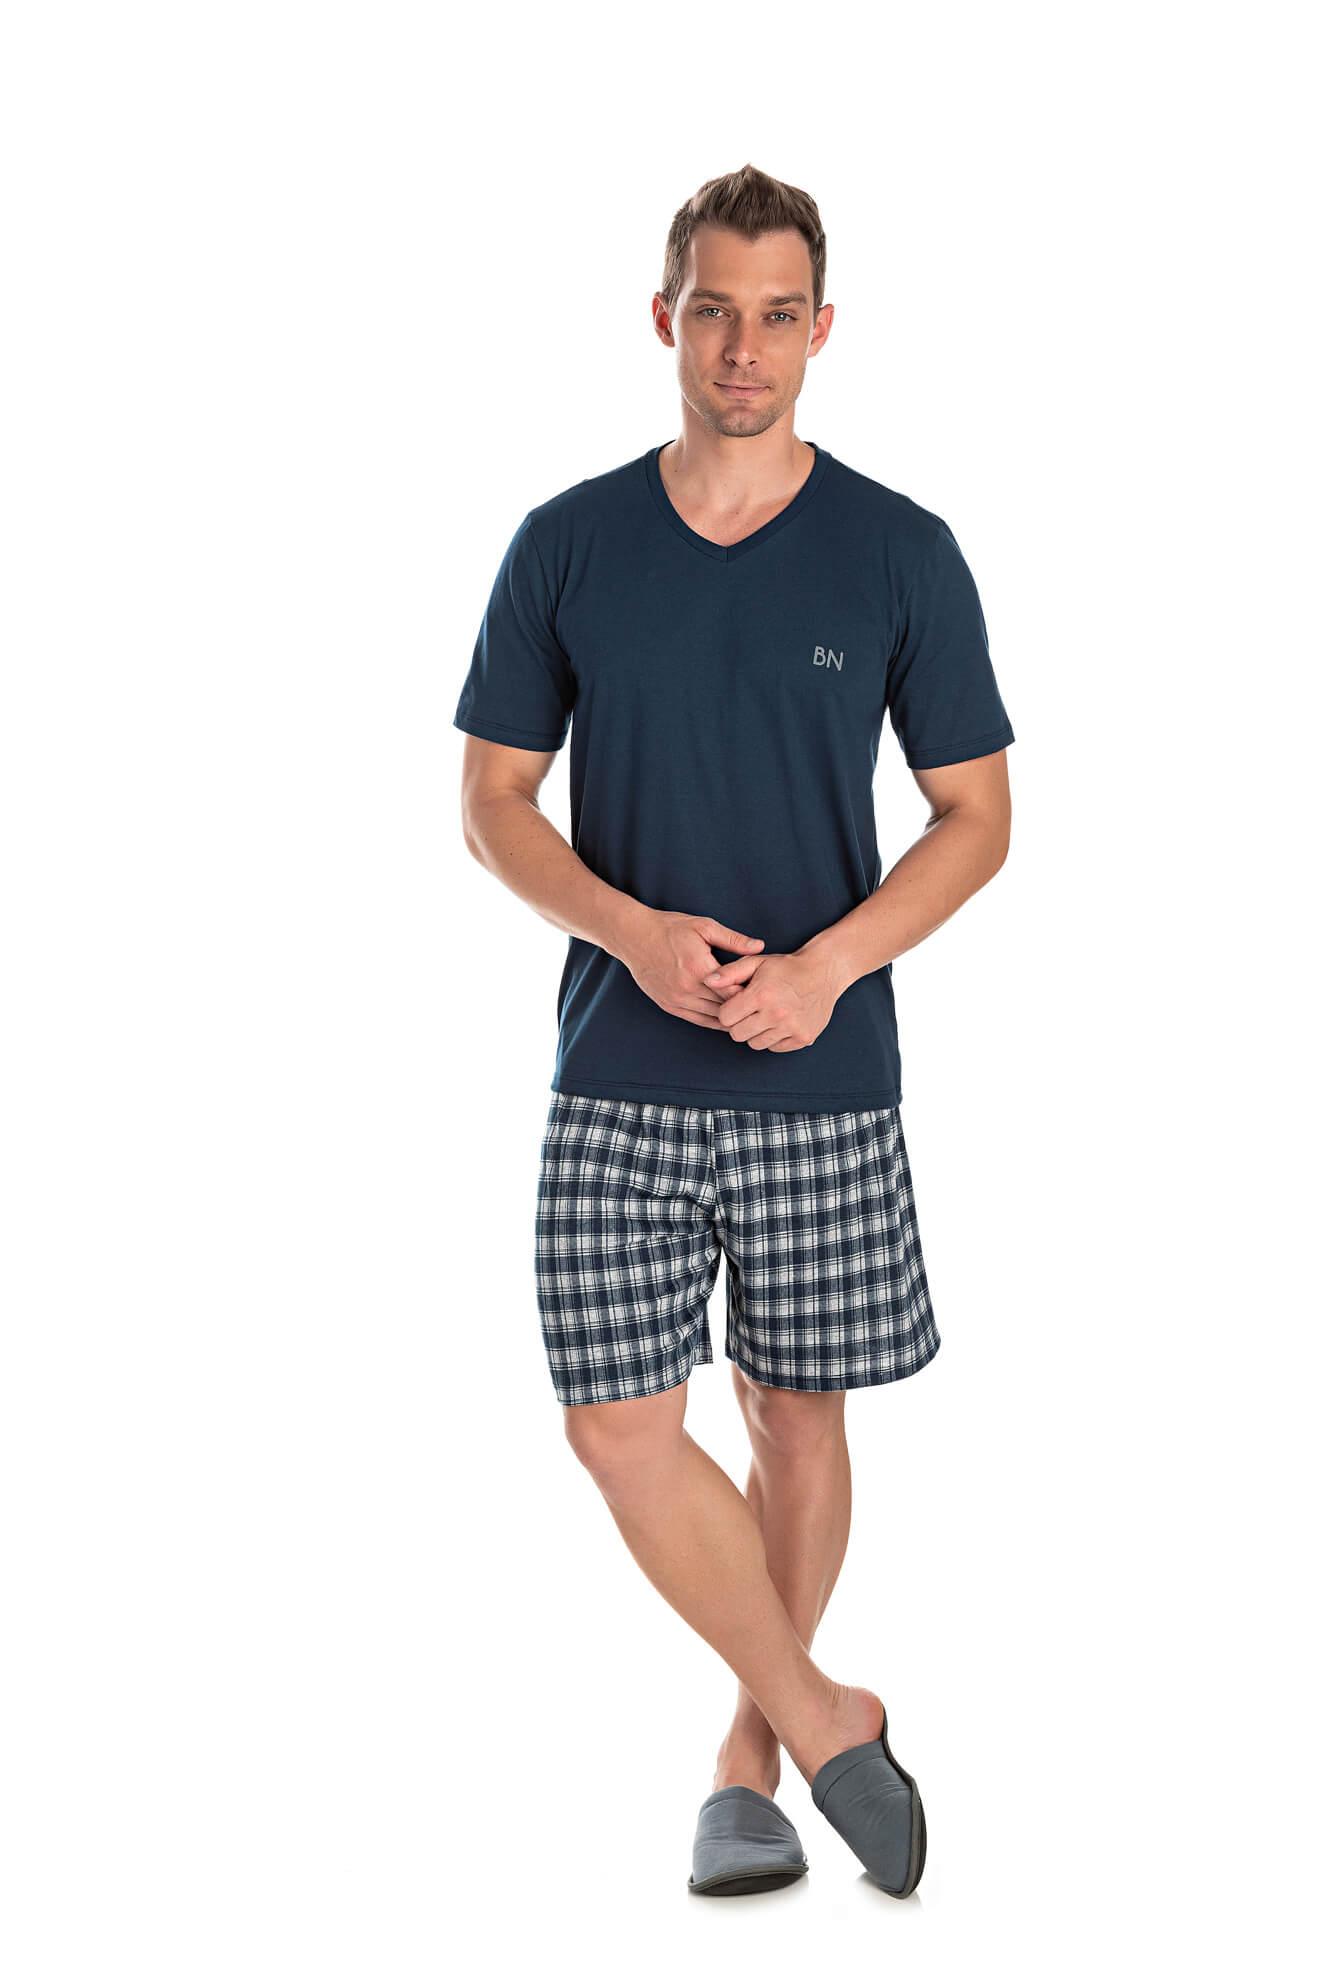 005/D - Pijama Adulto Masculino Bermuda Meia Estação Xadrez